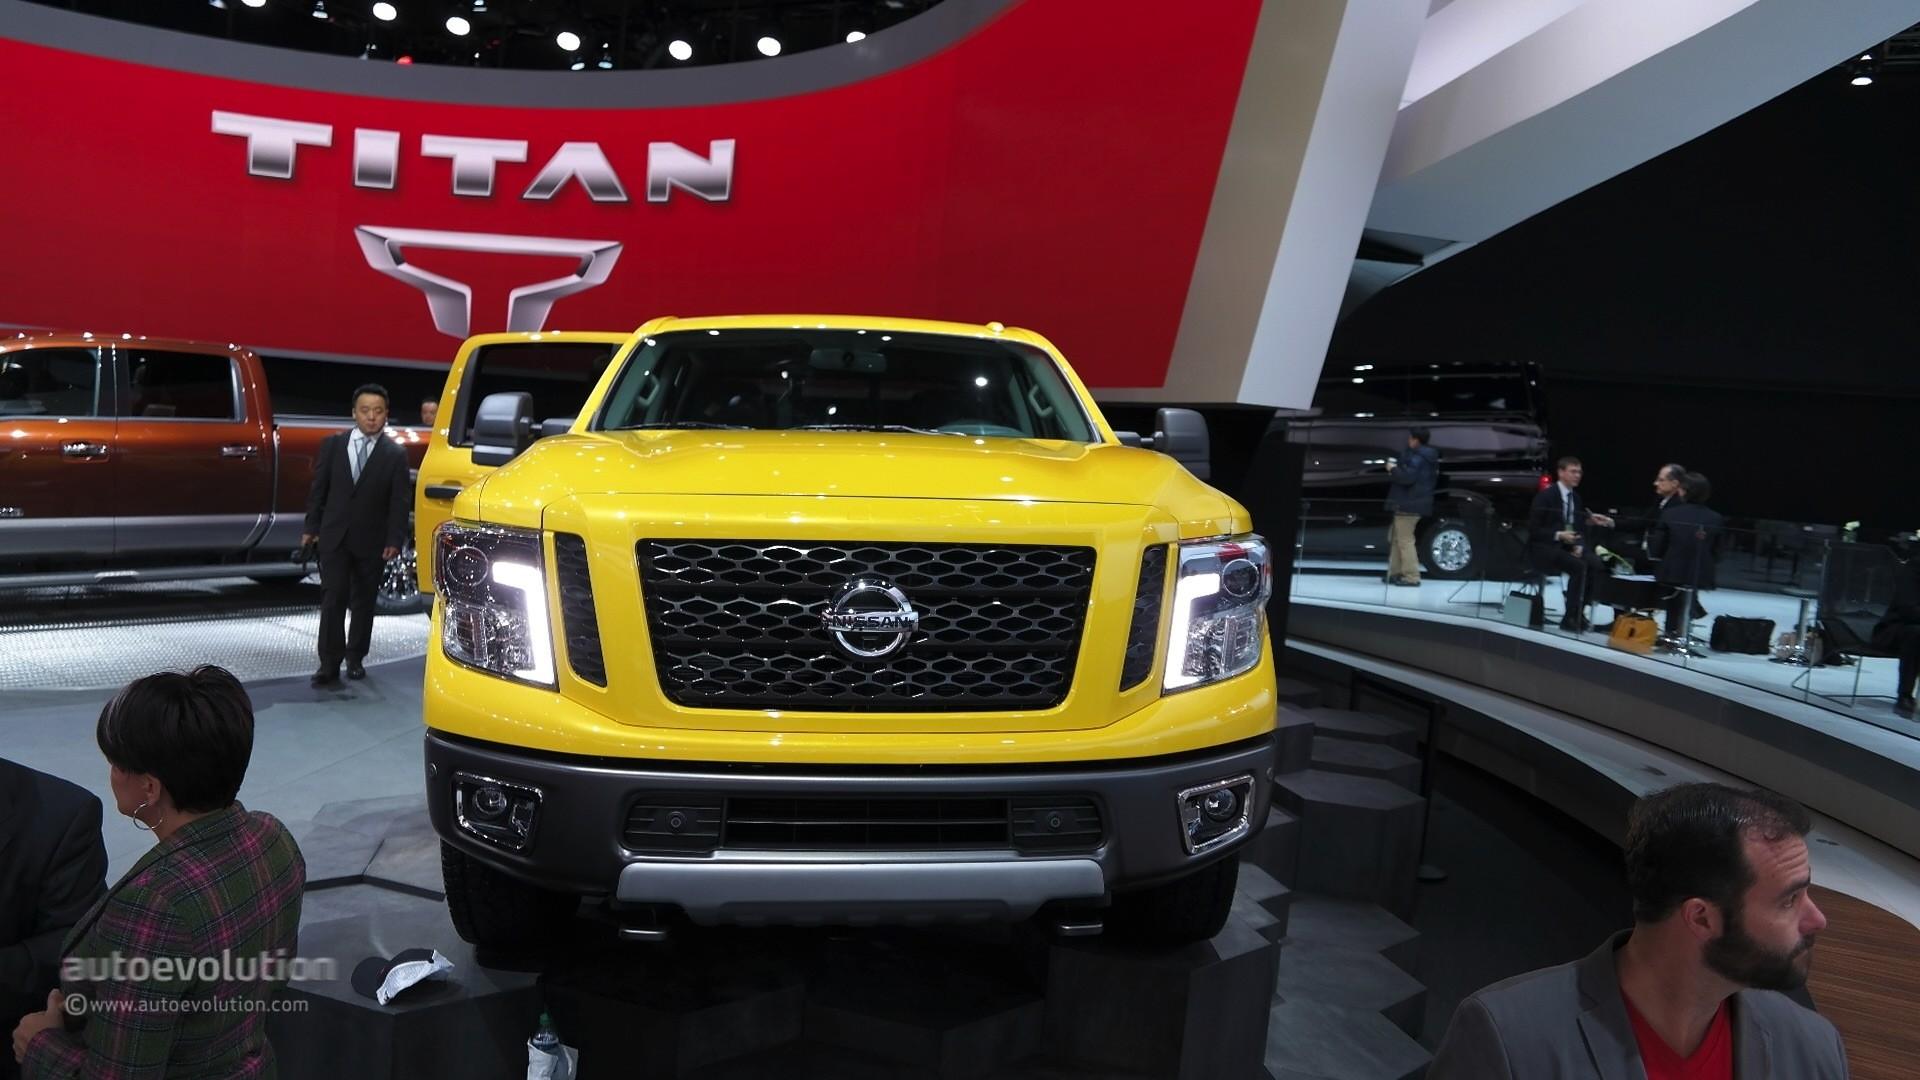 2016 nissan titan xd cummins diesel live photo 2015 detroit auto show